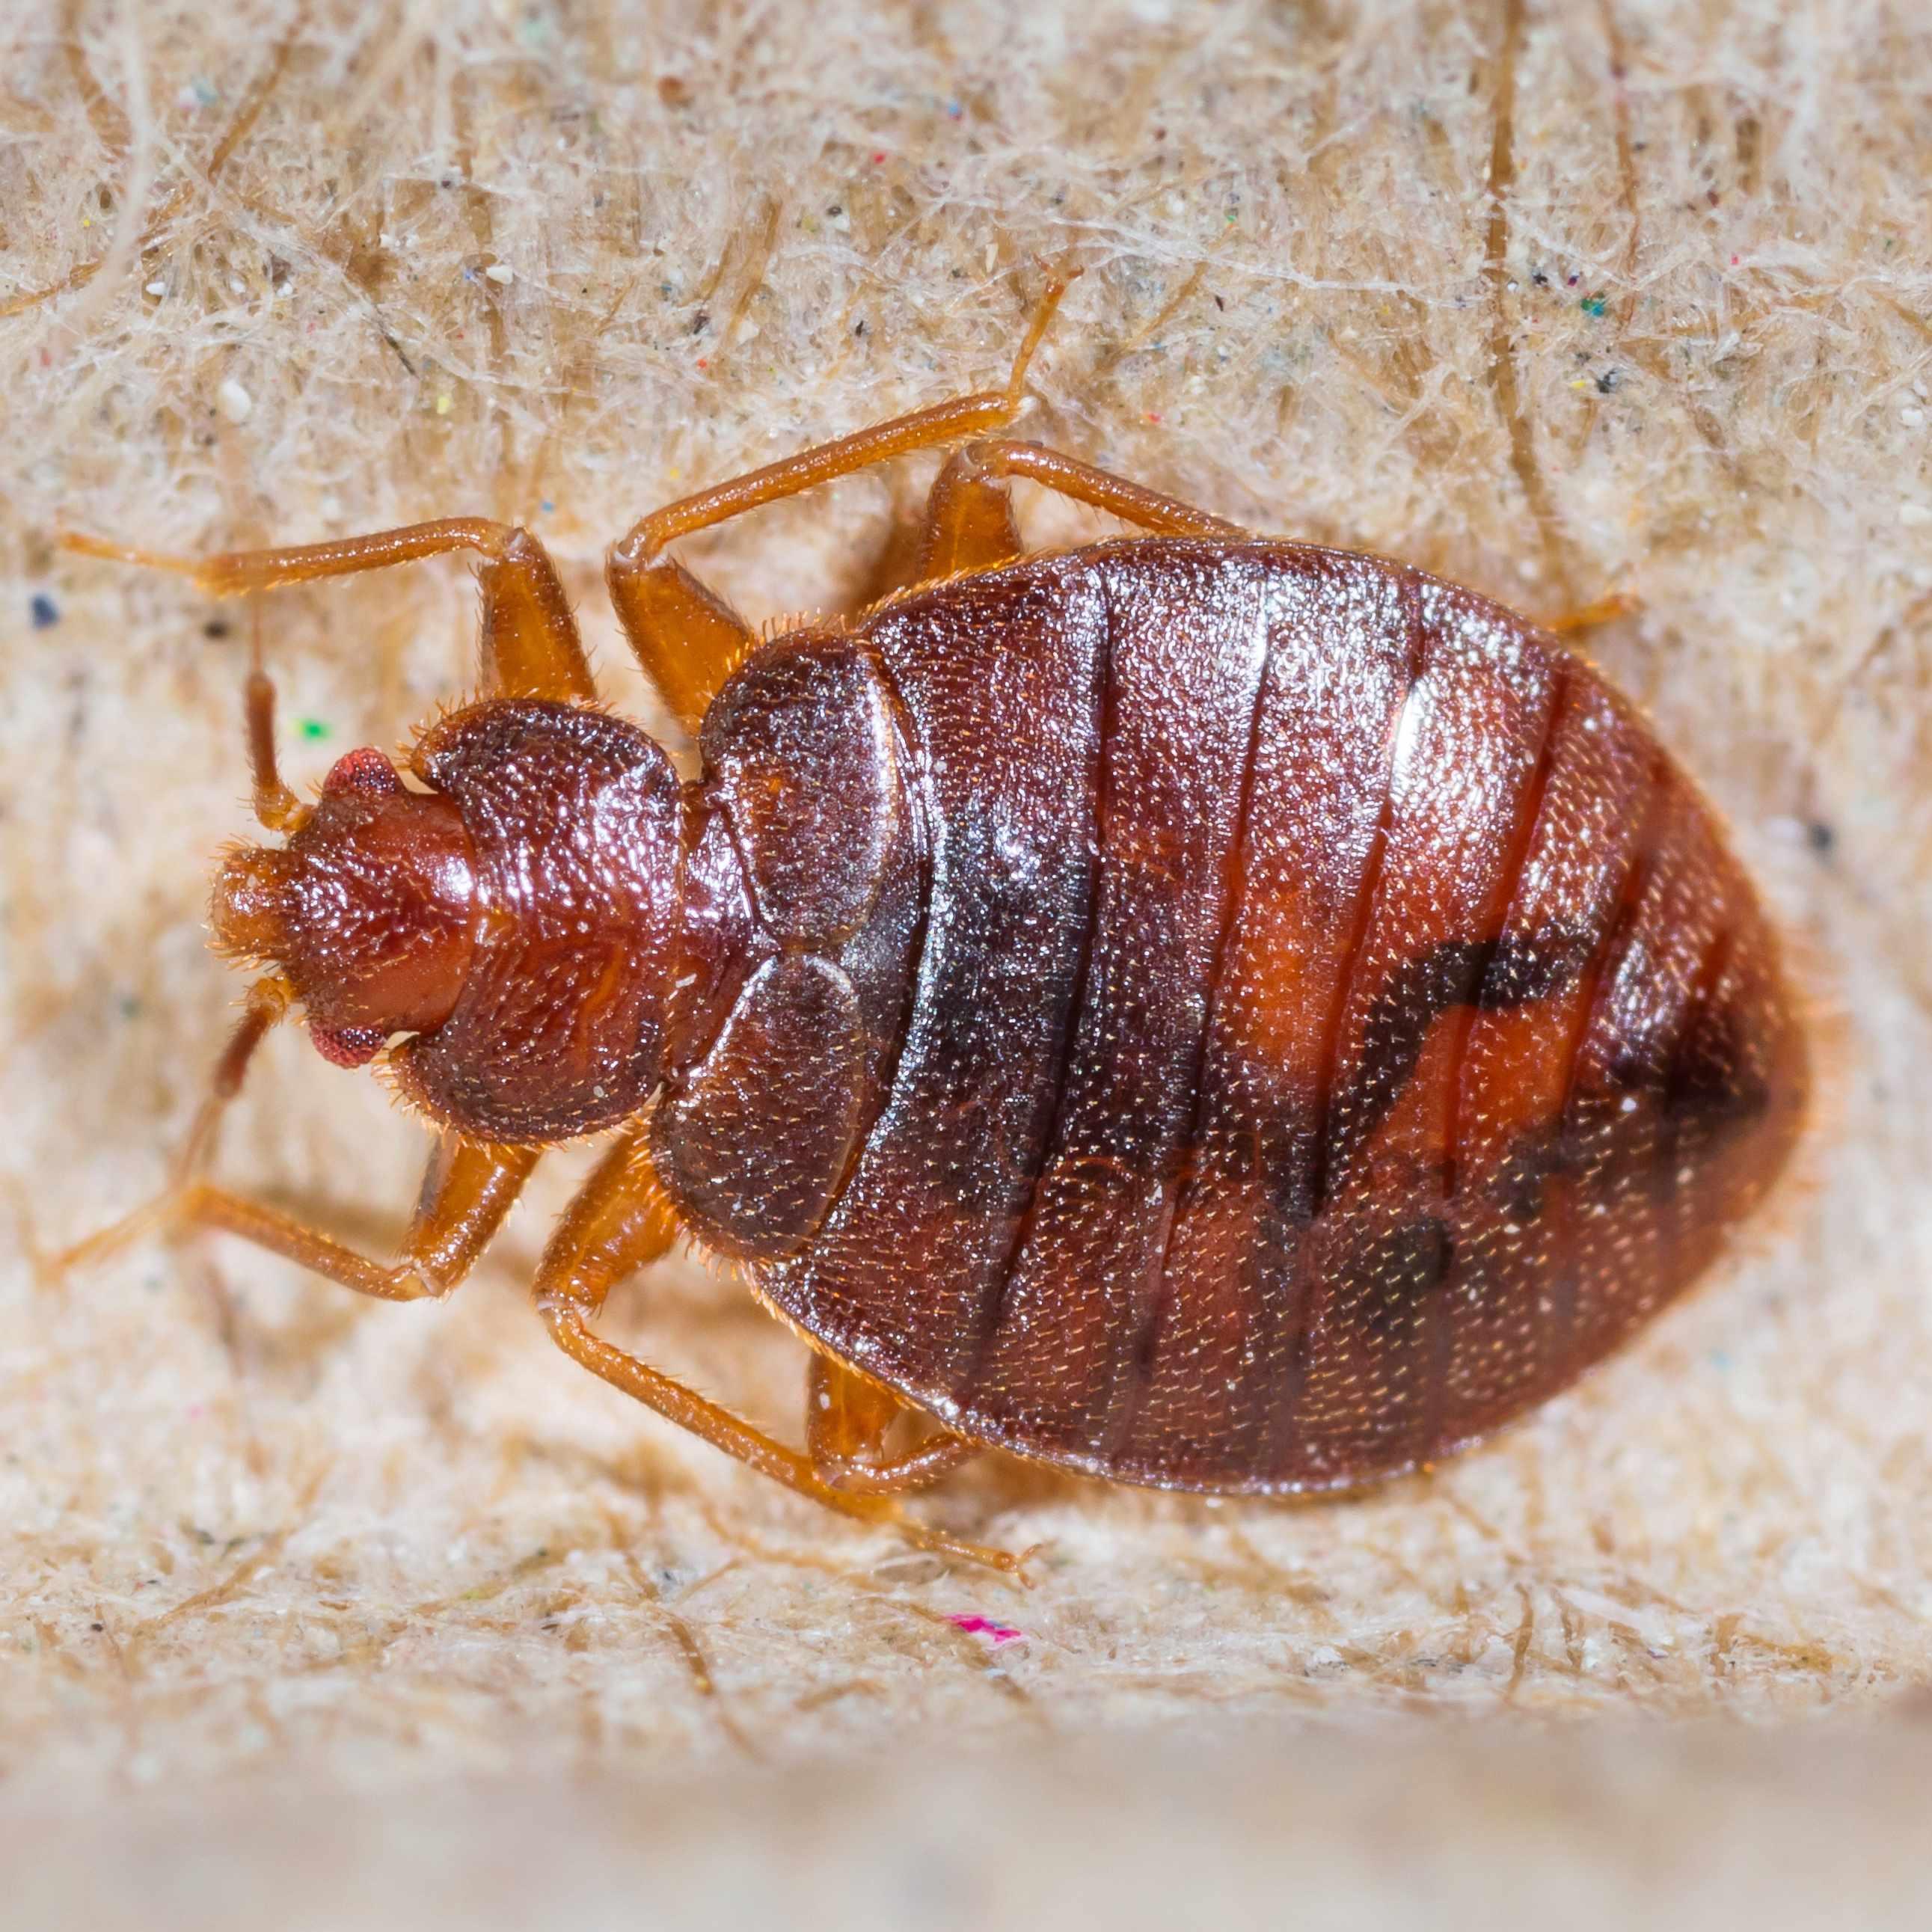 a closeup of a bedbug on a piece of cardboard